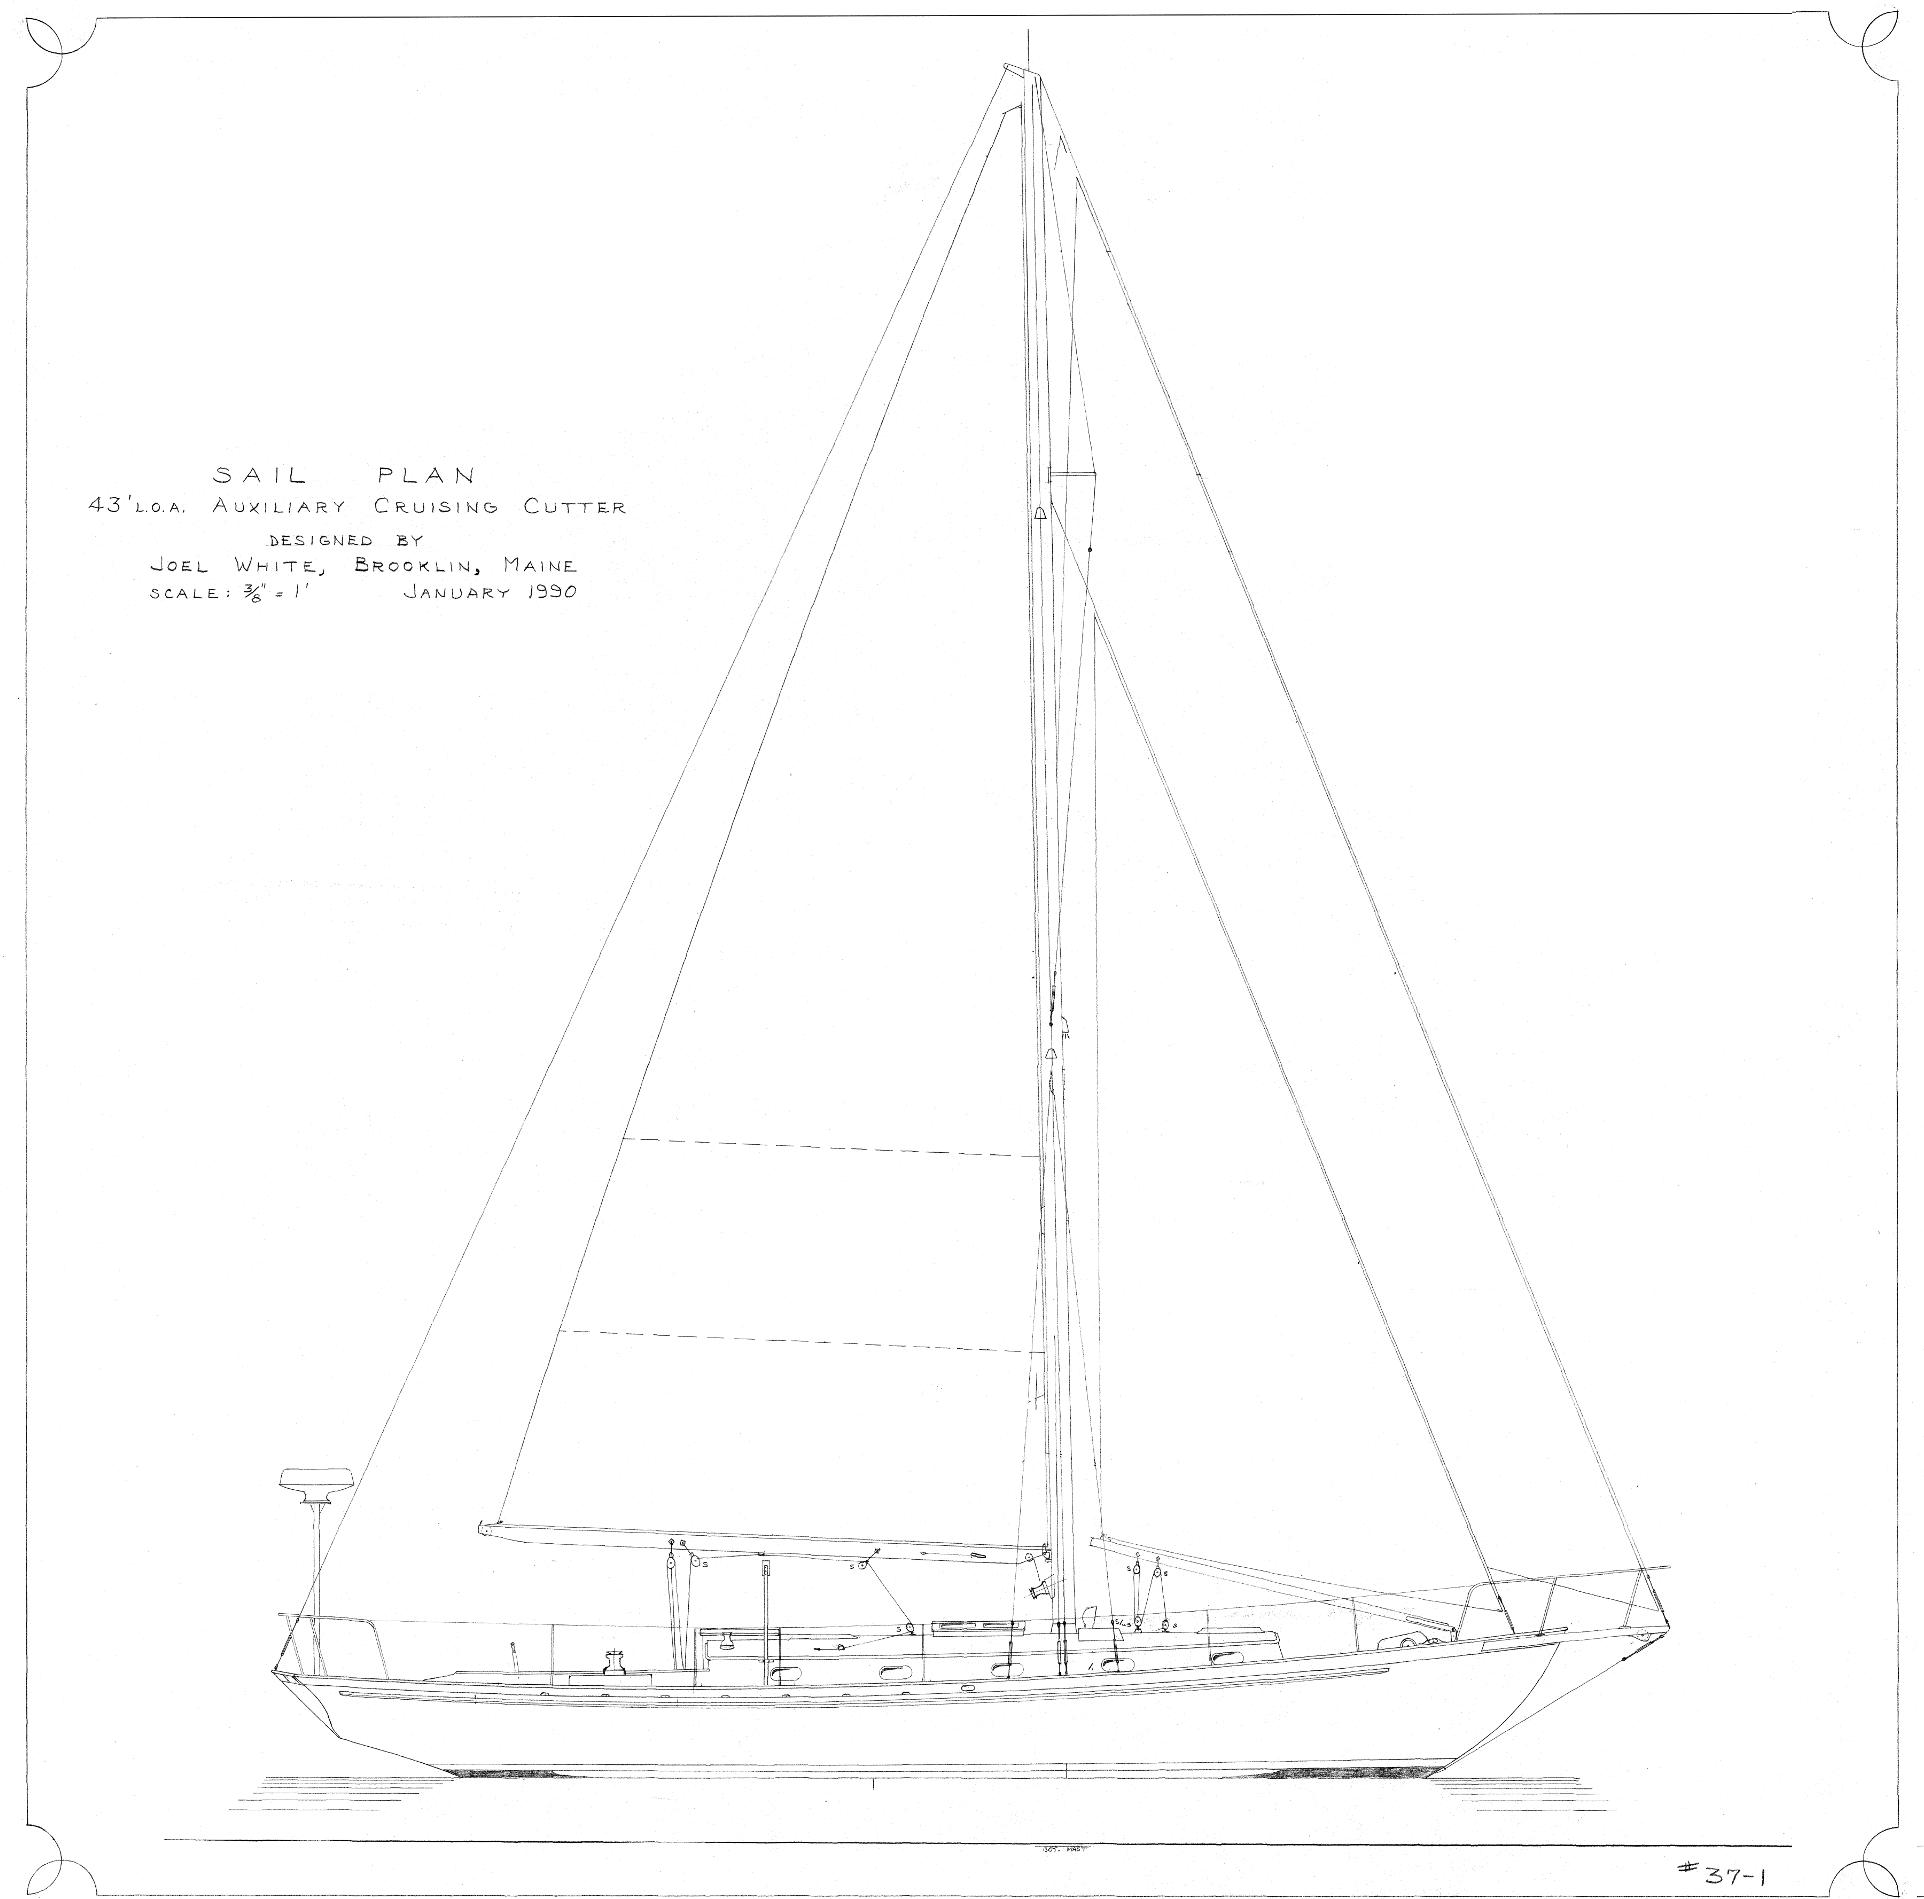 43' Sweet Olive Cutter JW#37 sailplan update2